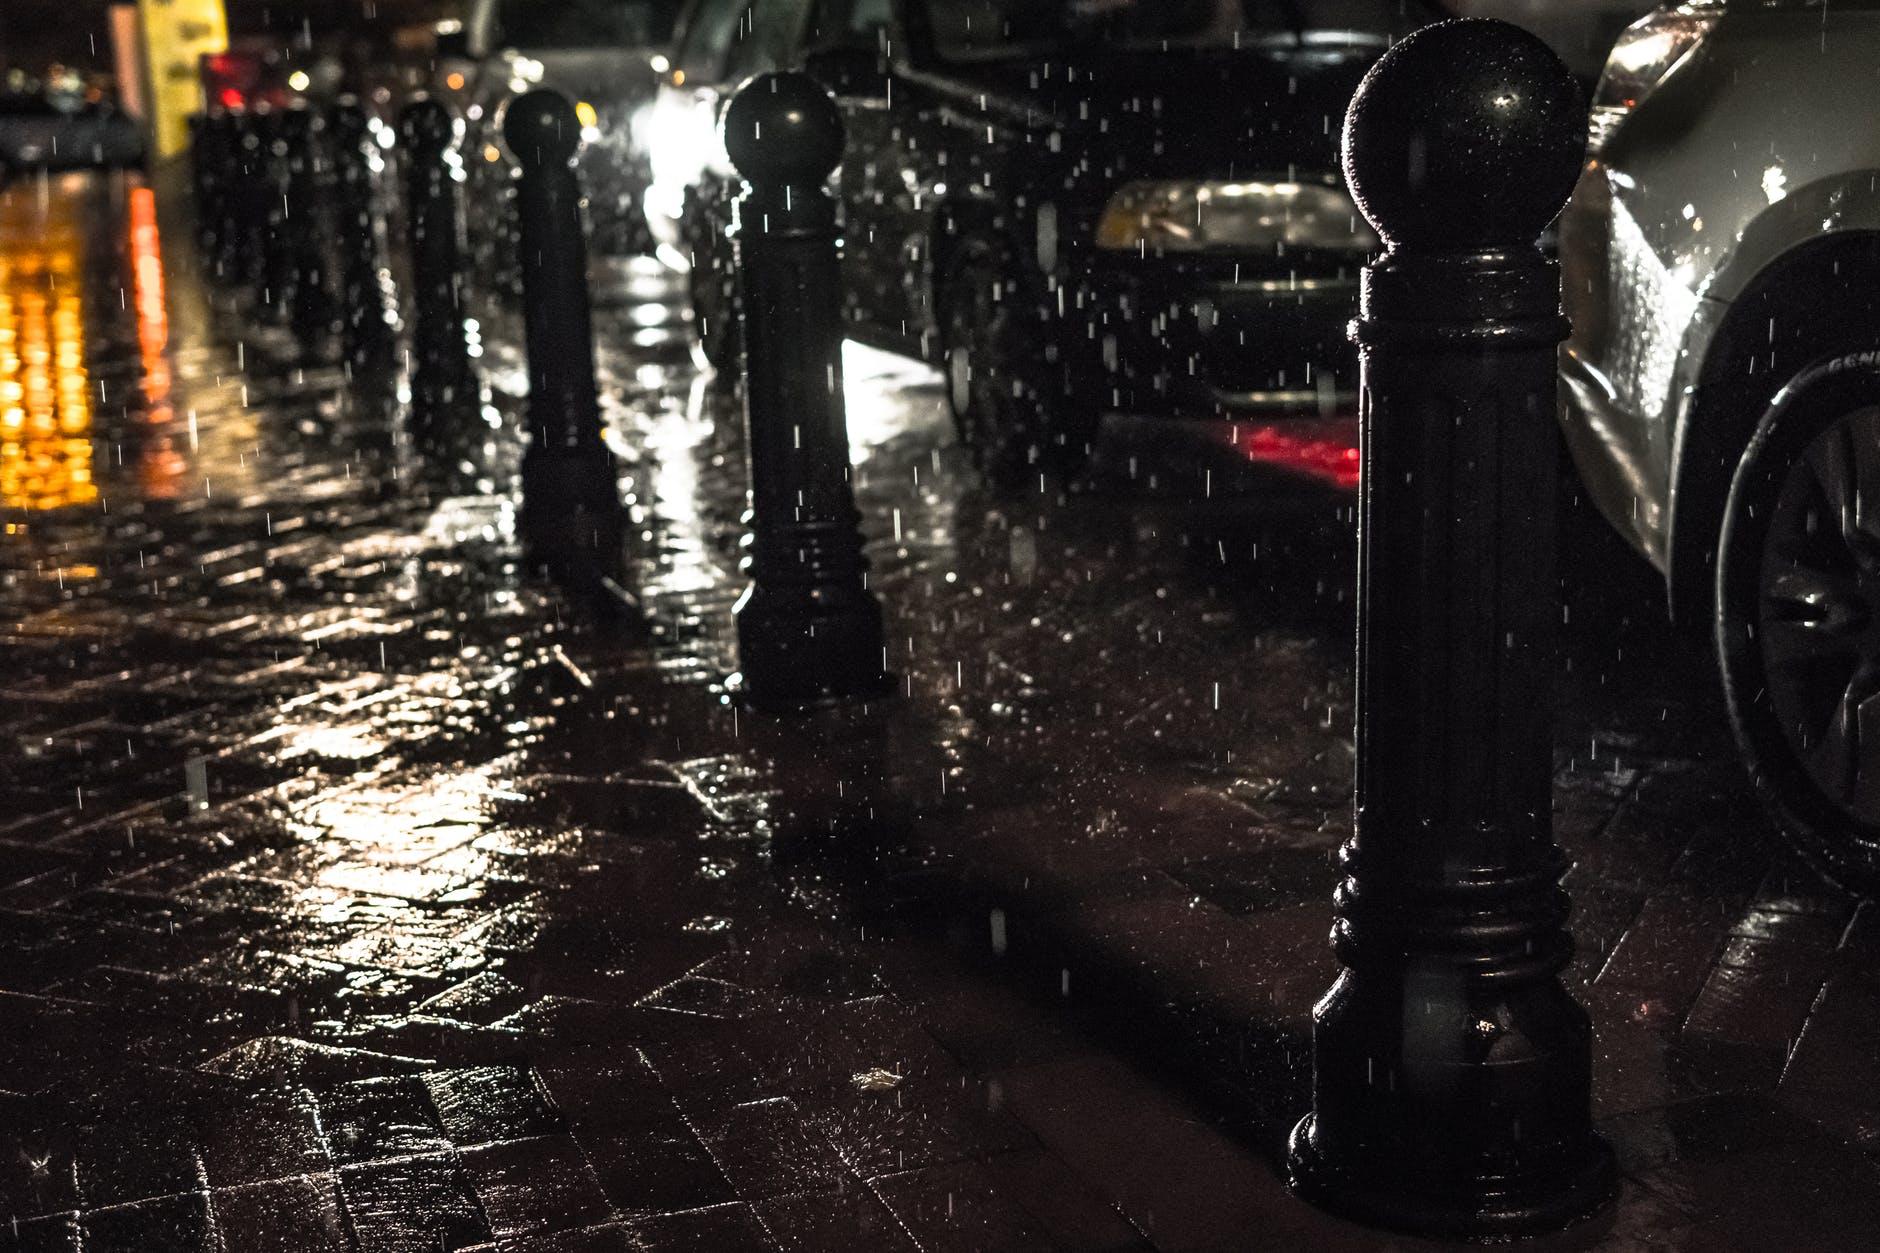 black posts on black pavement beneath falling rain